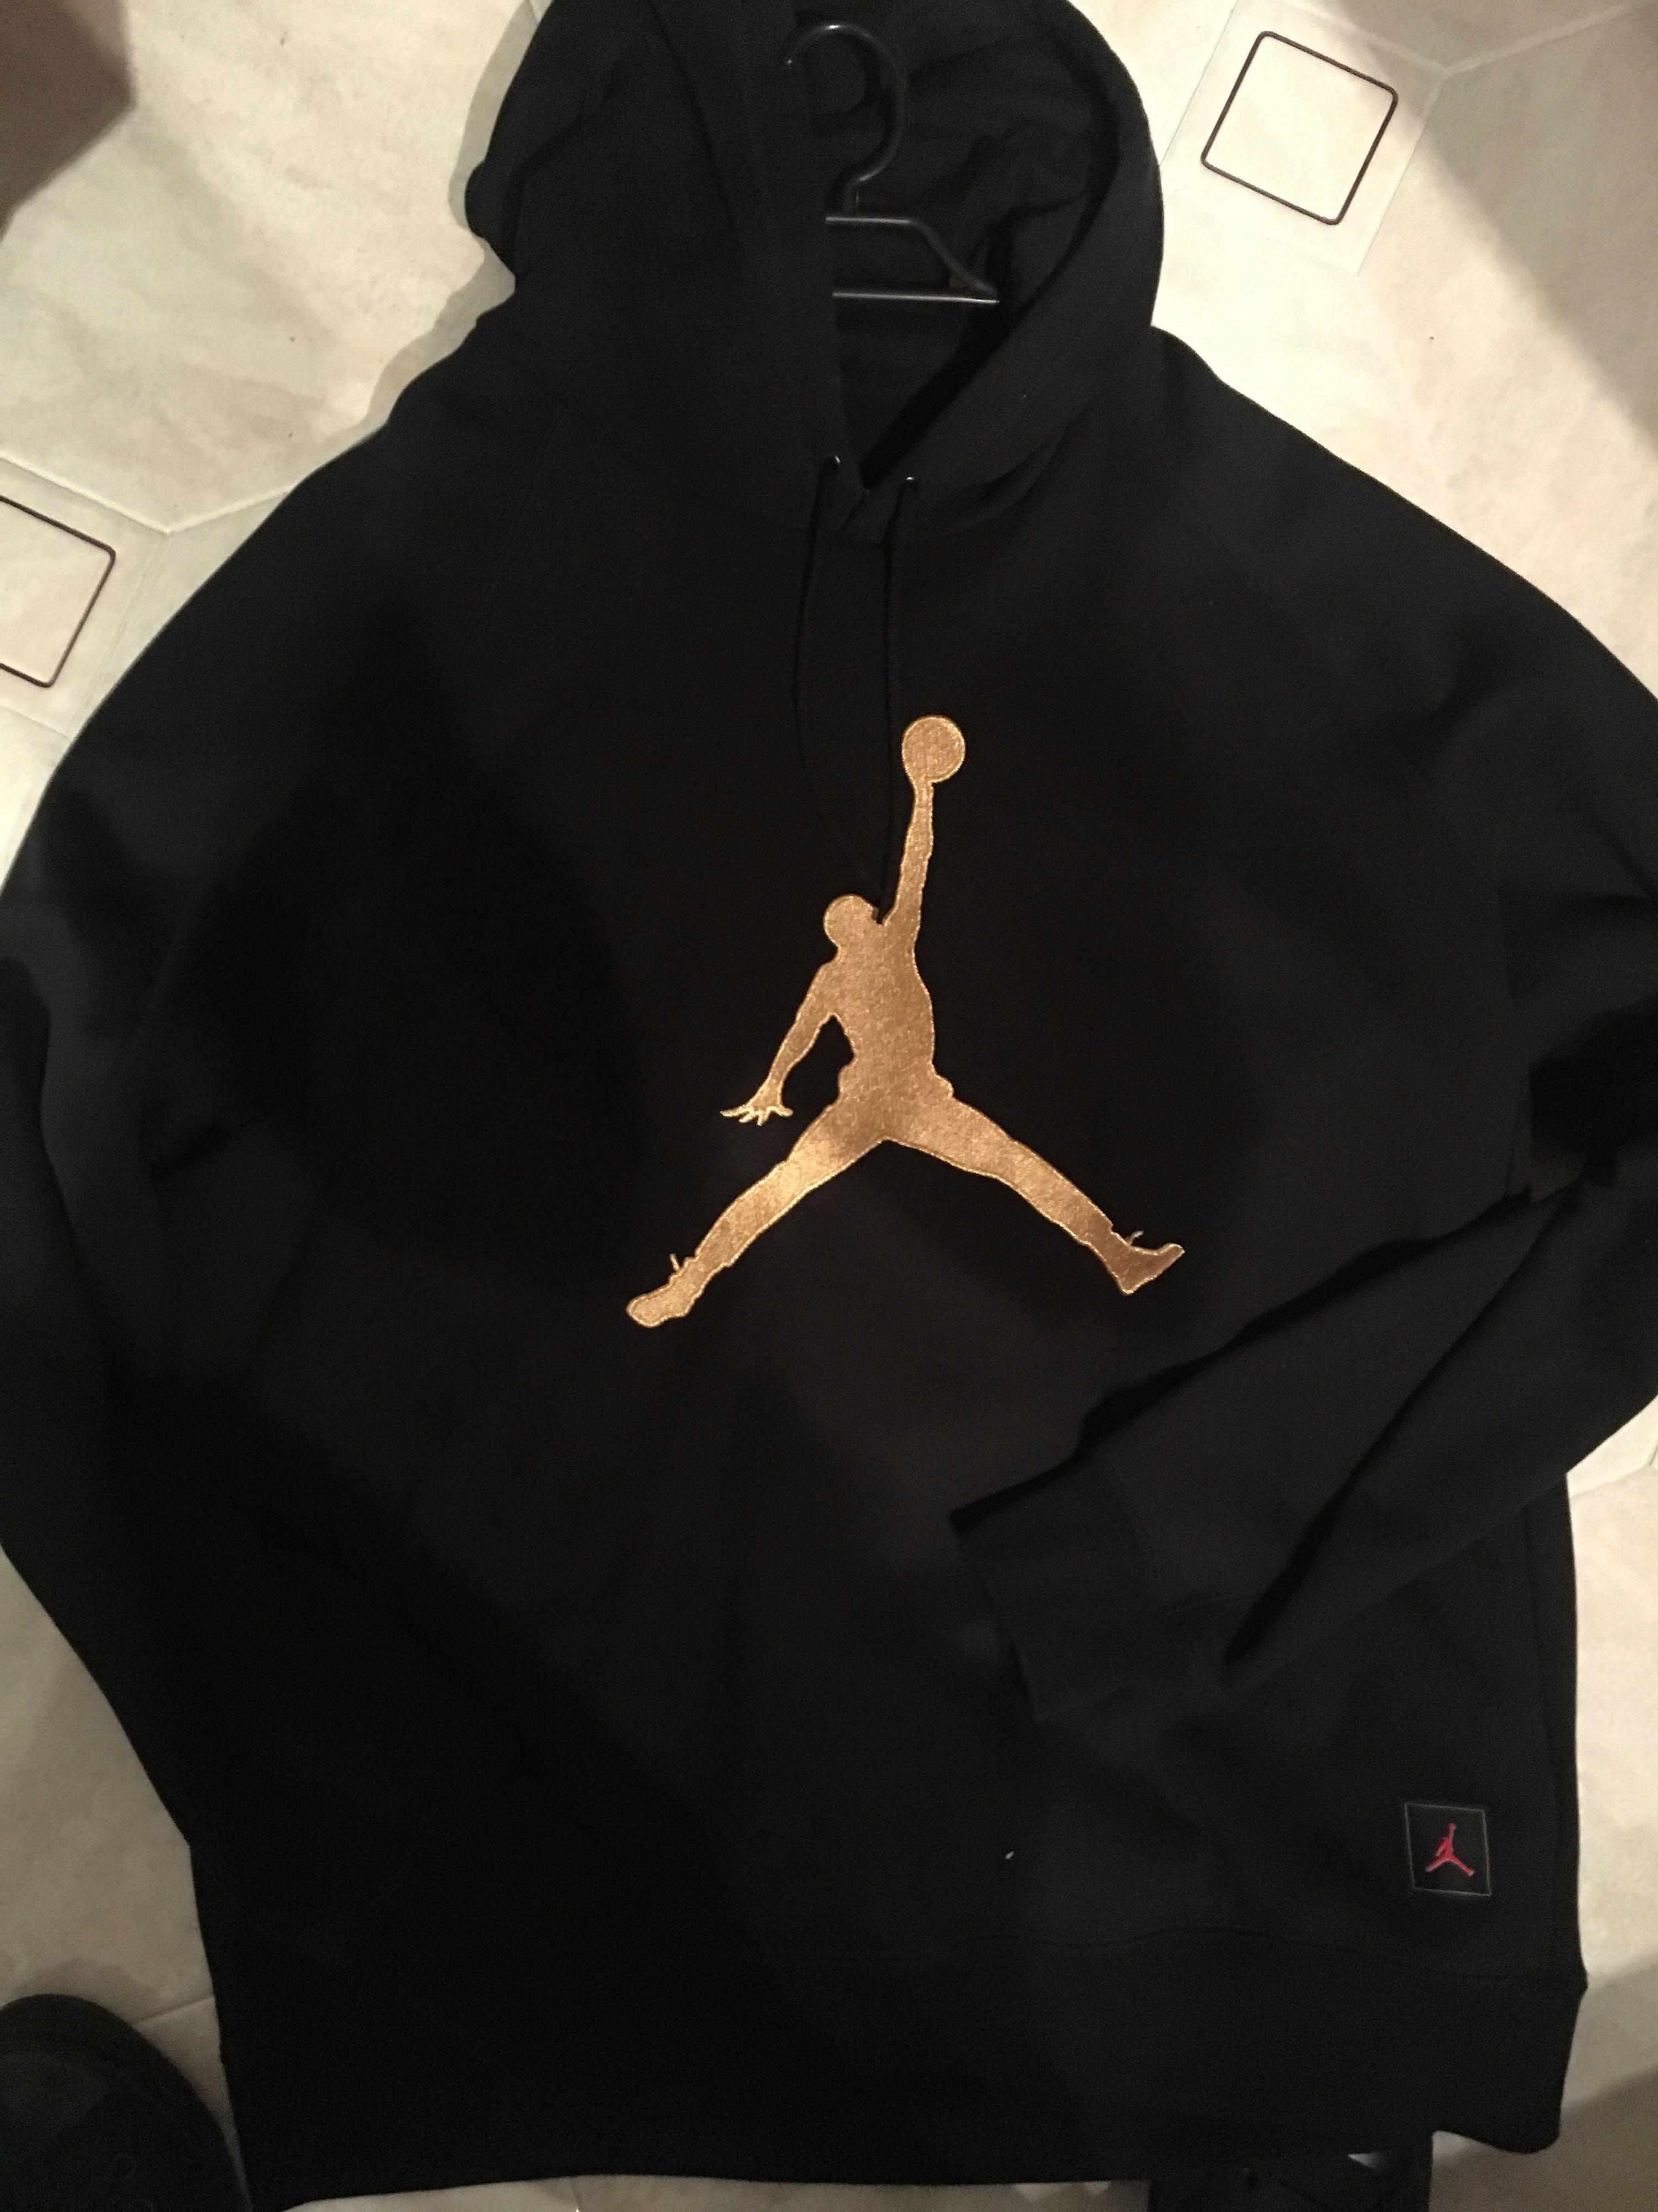 9a2930034b1c0f Drake OVO x Air Jordan hoodie